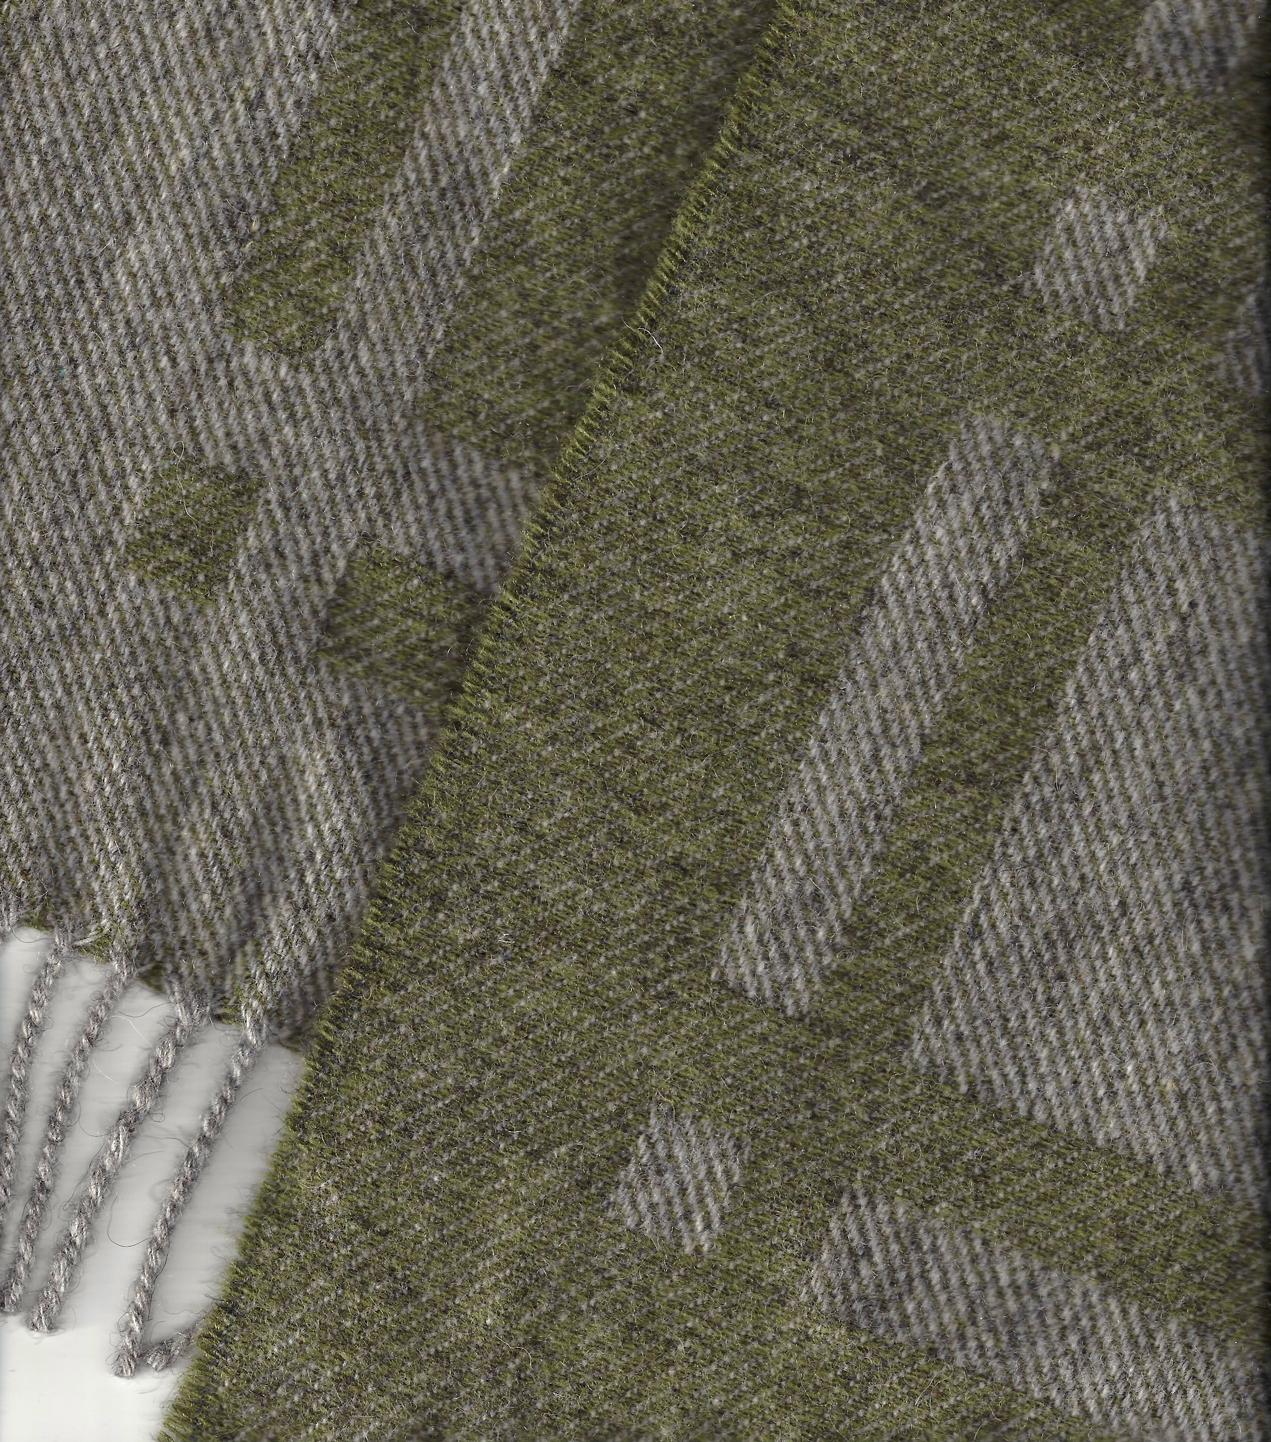 Laura's Loom, Cumbrian Summer Blanket, Moss, wool, British